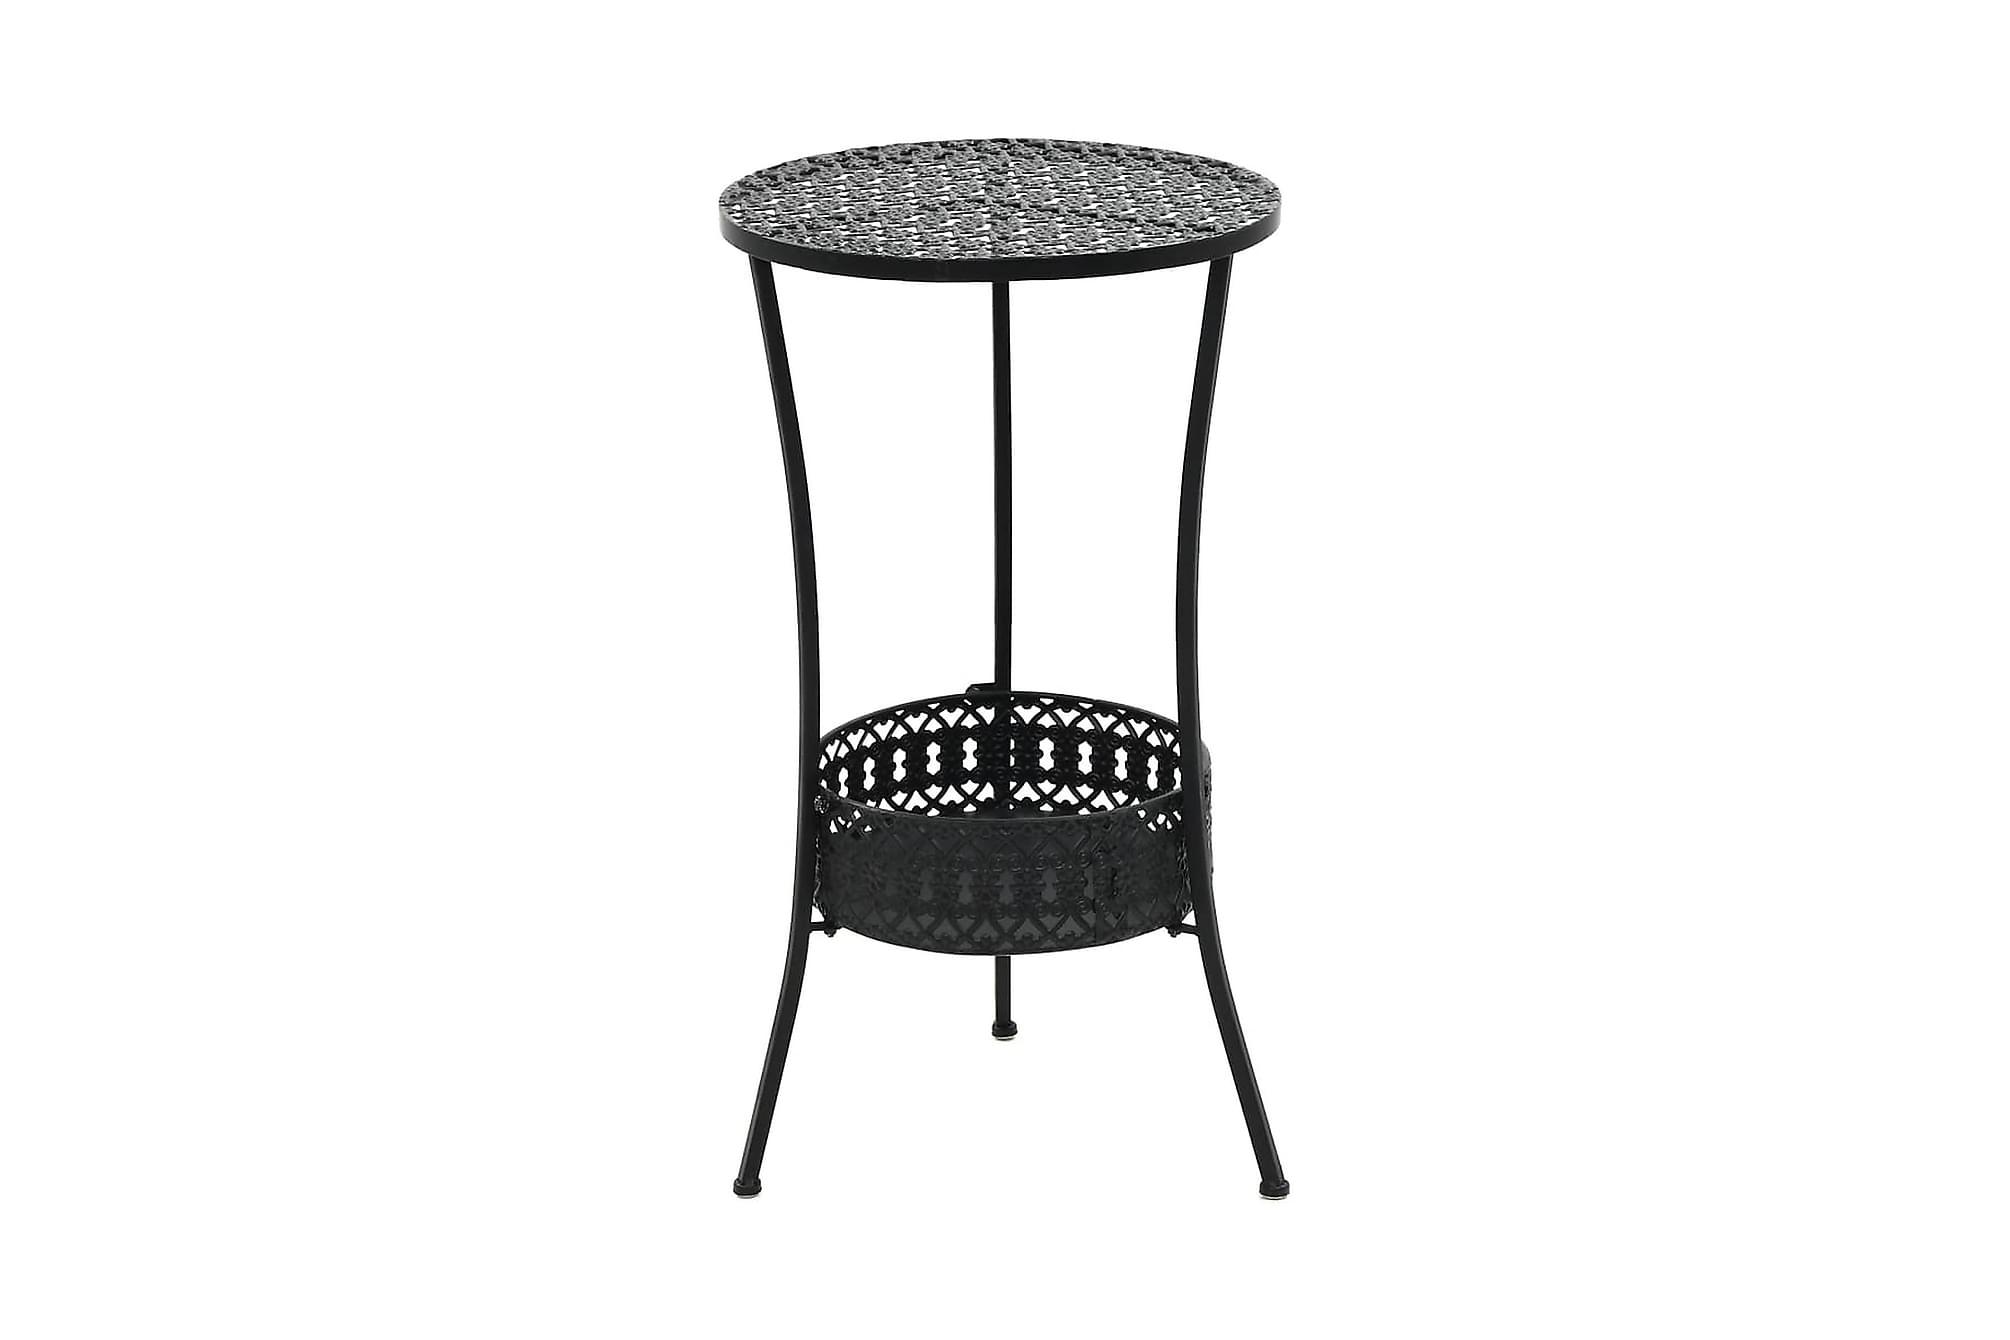 Bistrobord svart 40x70 cm metall, Balkongbord